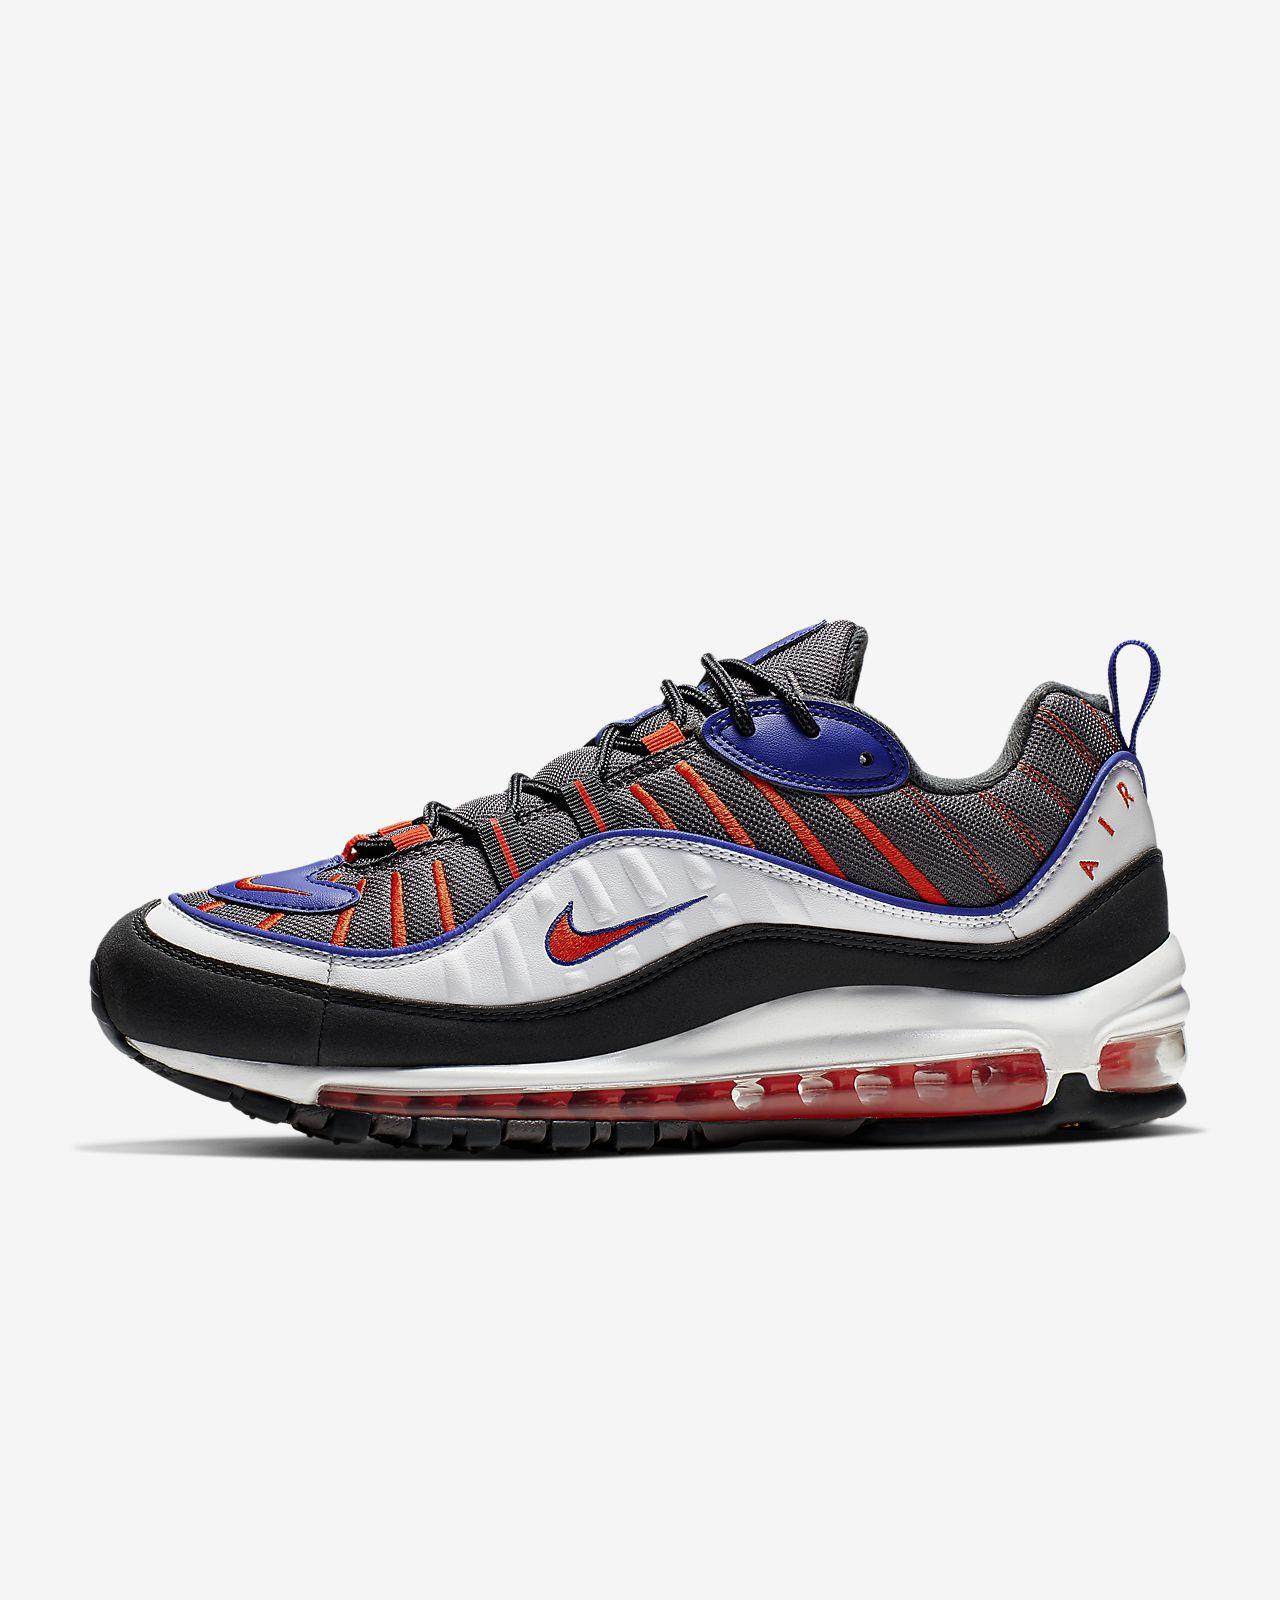 Nike Air Max 98 Herenschoen